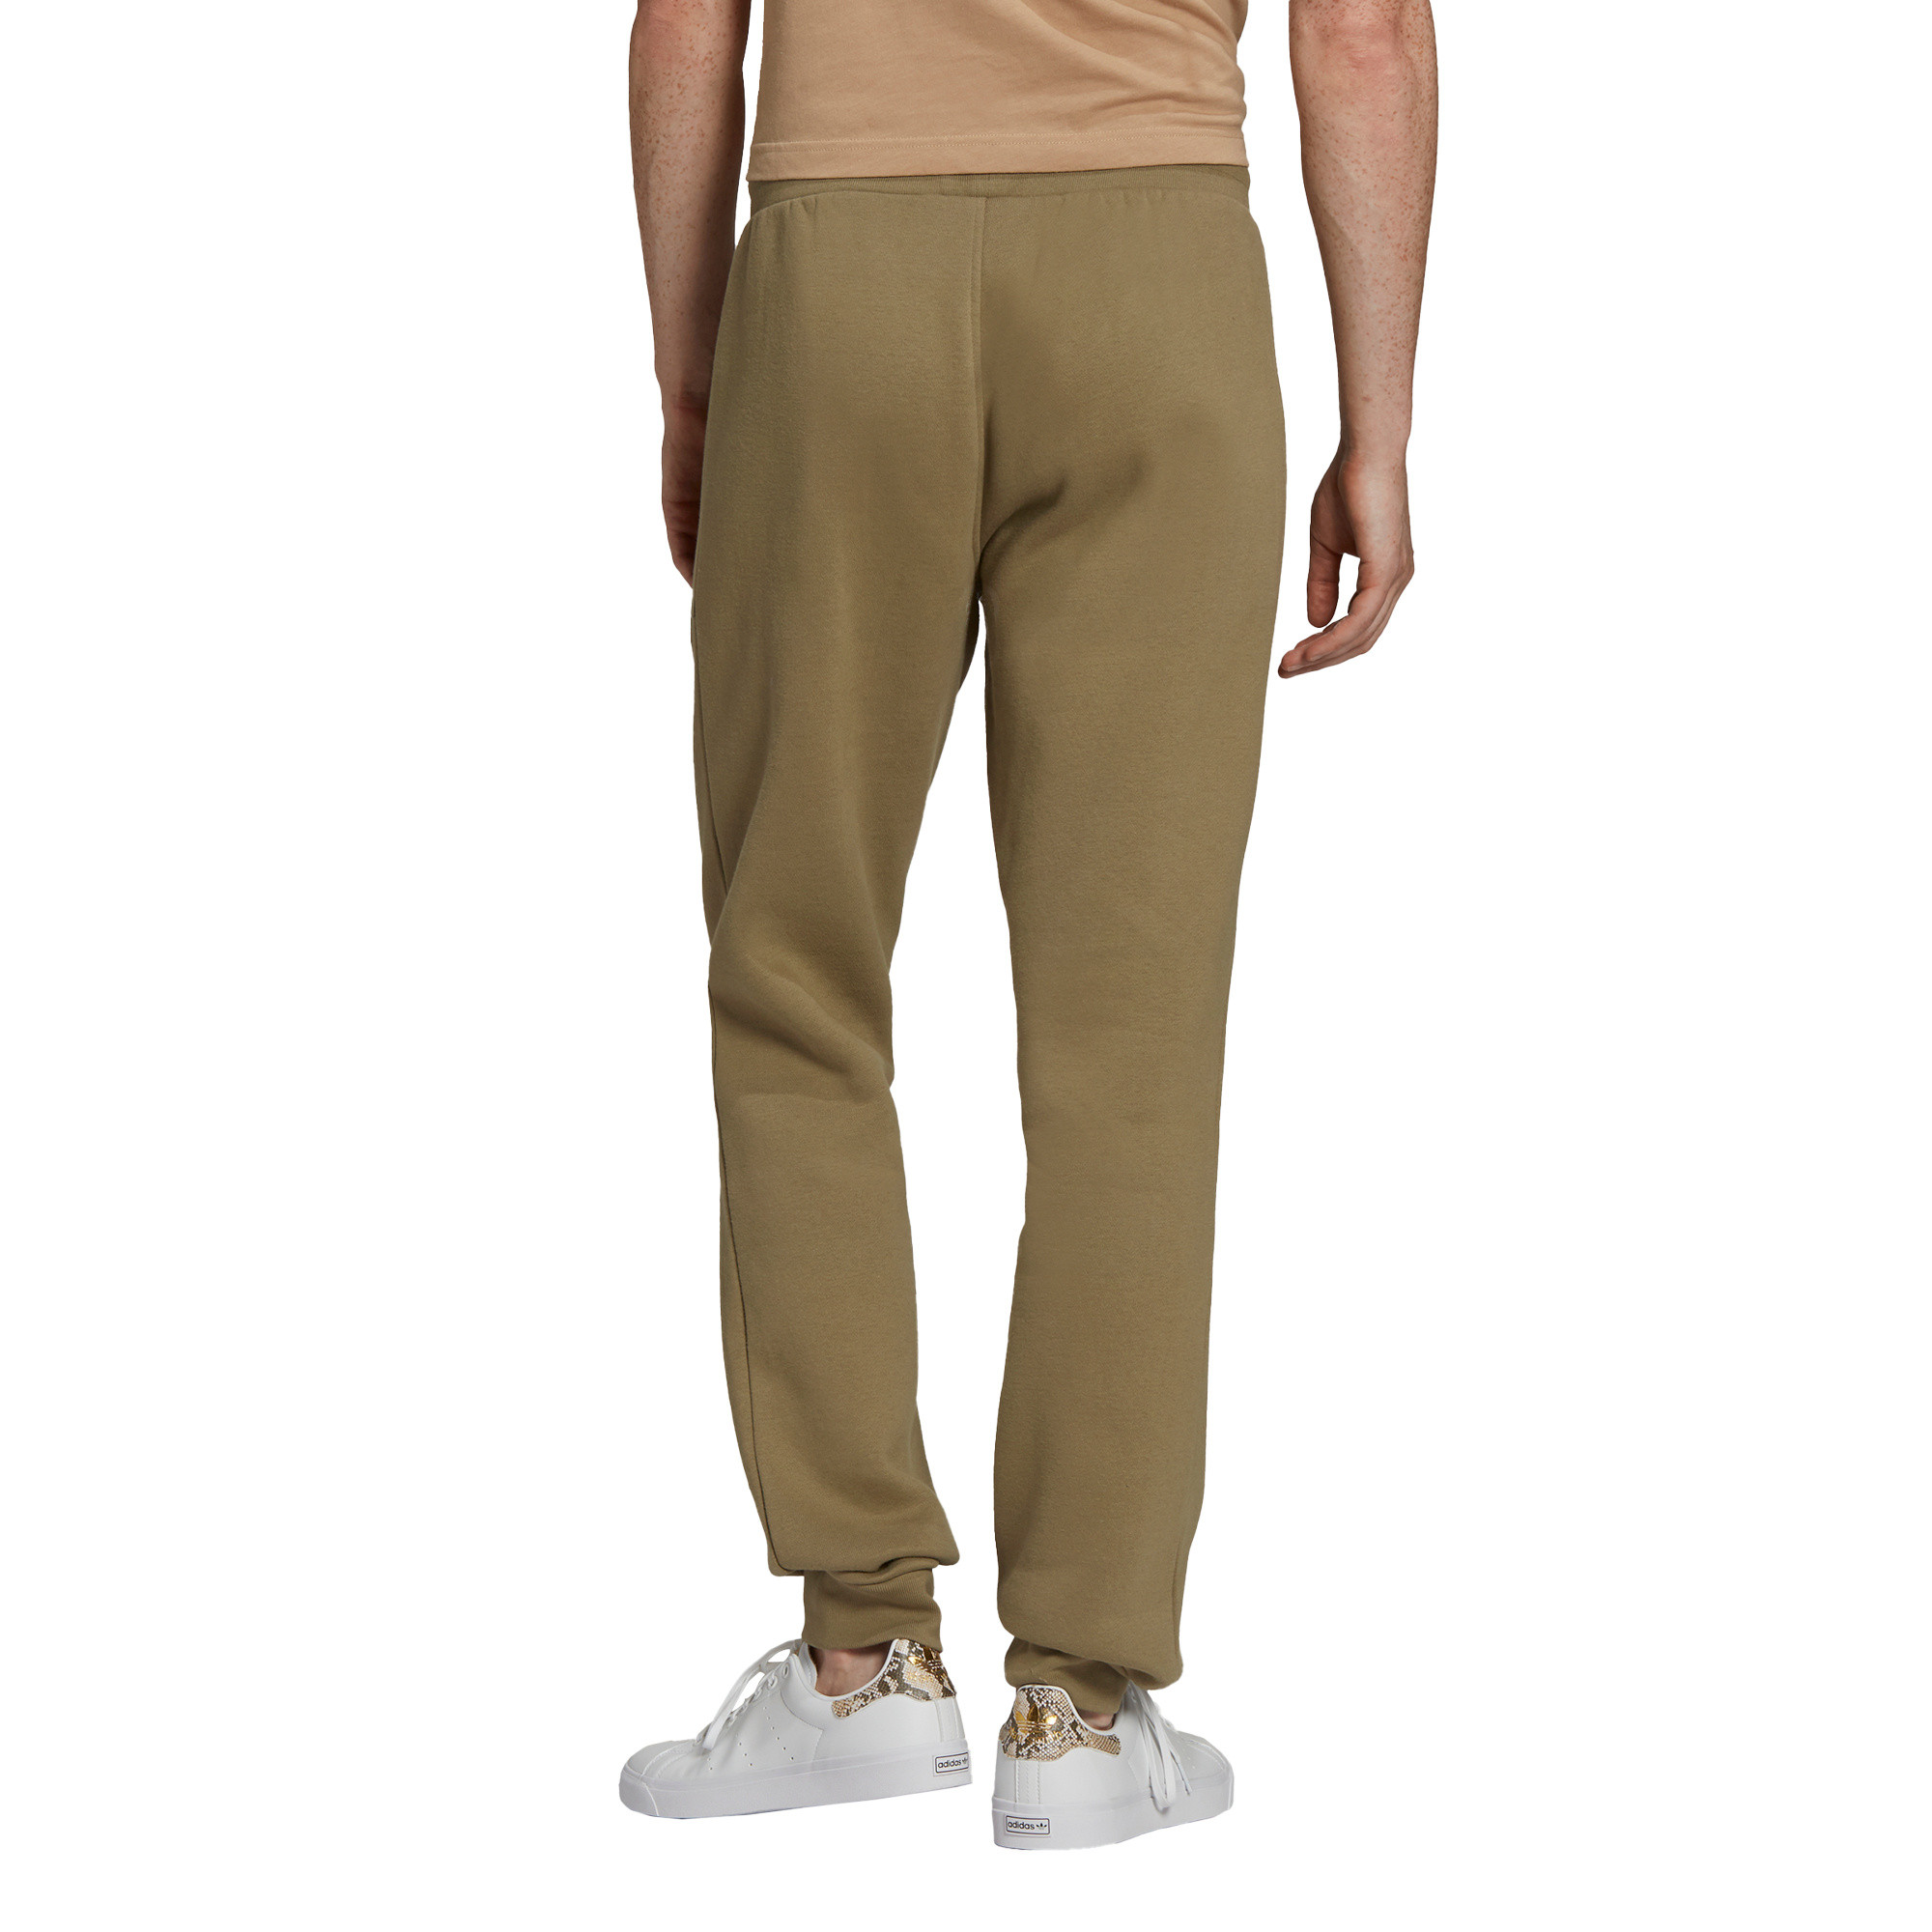 Pantaloni adicolor Essentials Trefoil, Verde, large image number 3